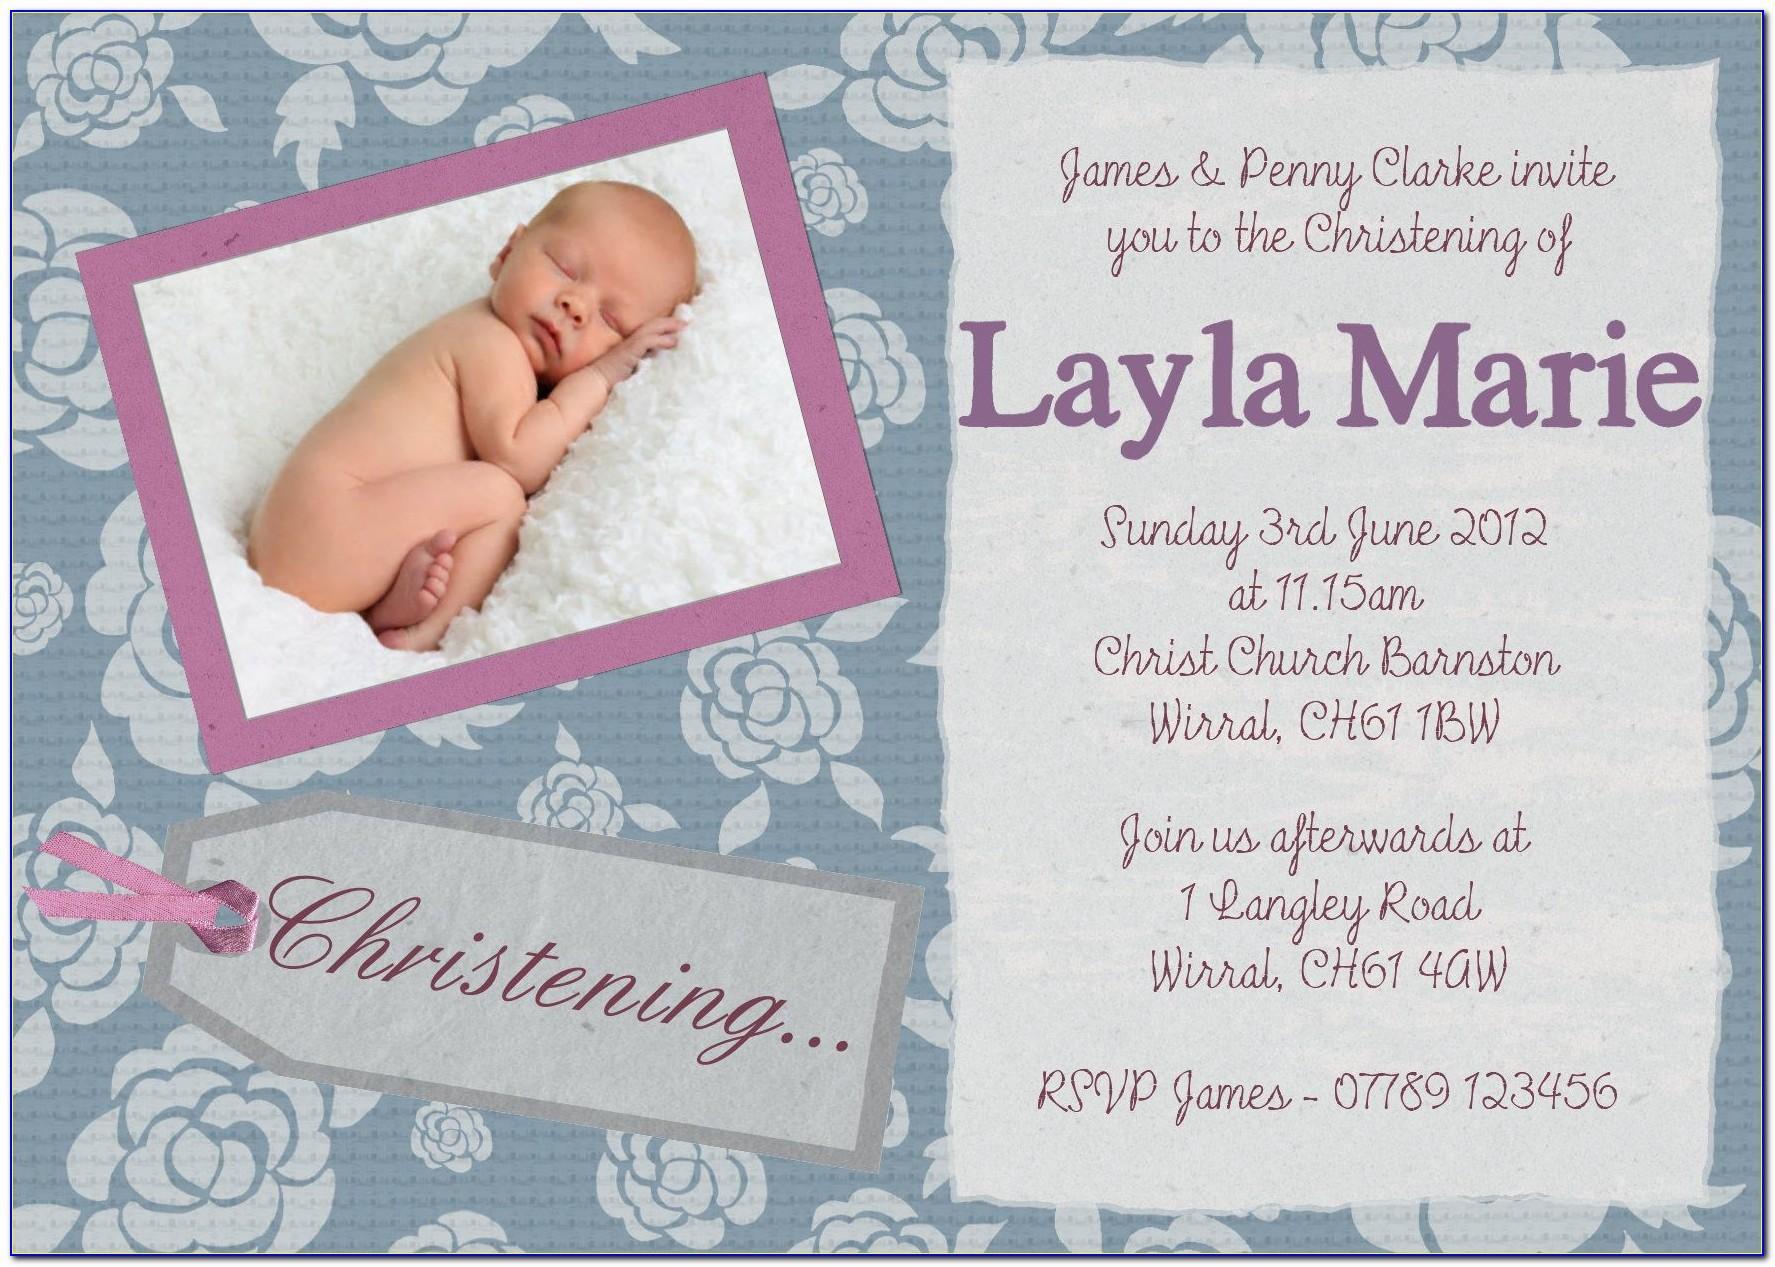 Unique Invitation Designs For Baptism